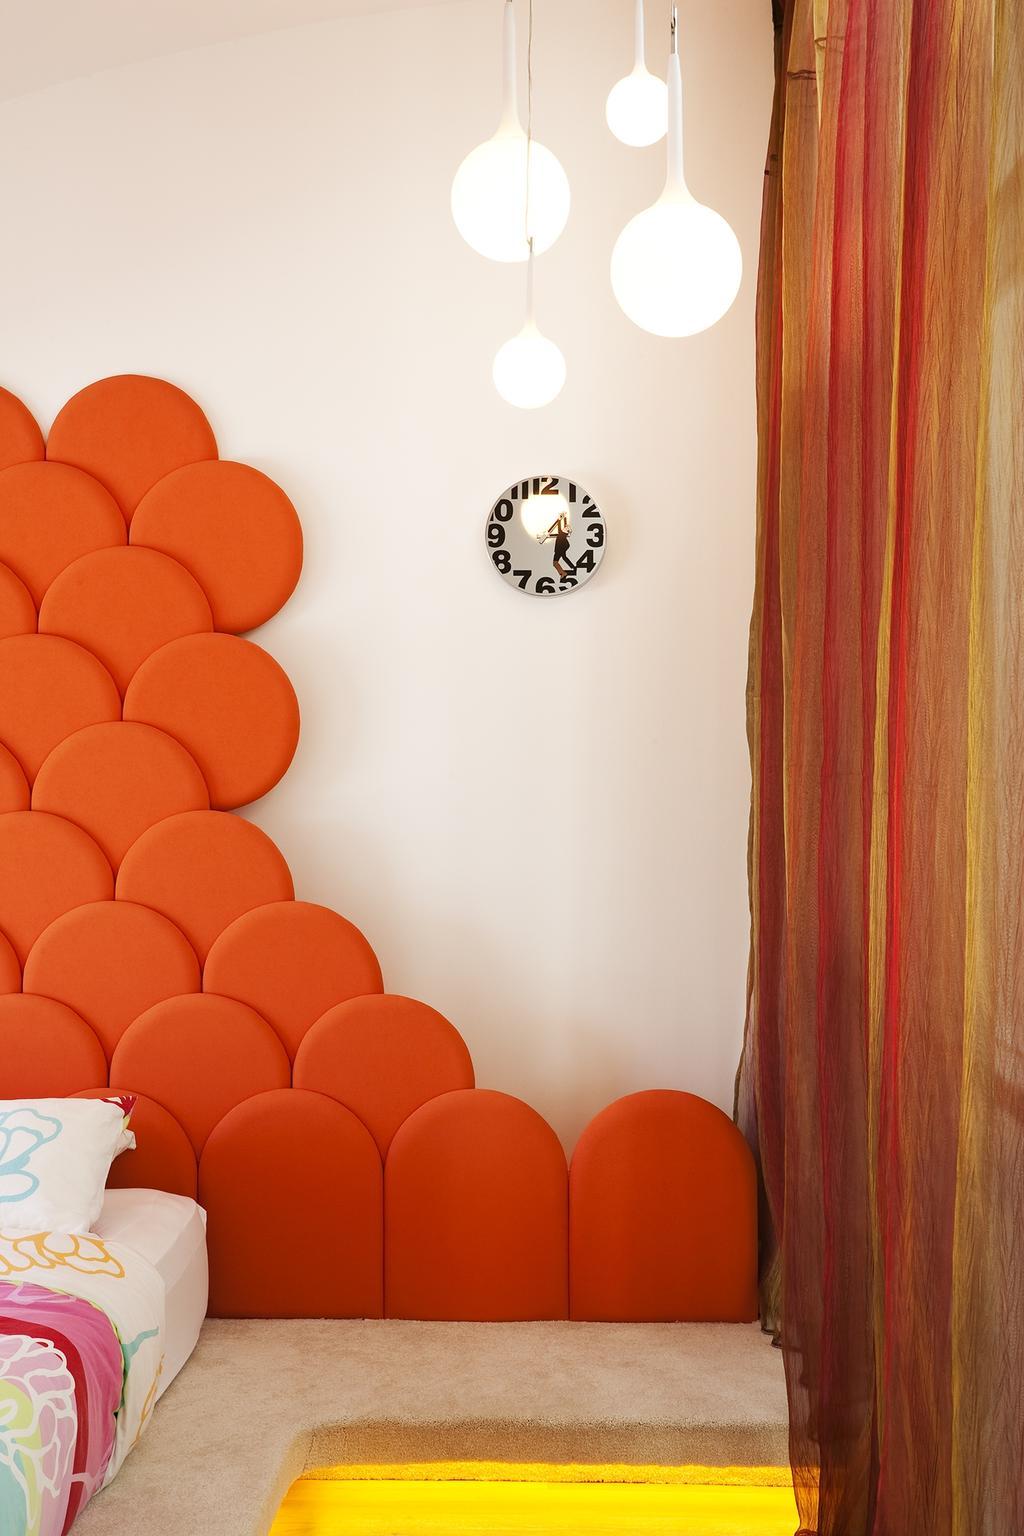 Retro, Landed, Bedroom, Lichi Avenue, Interior Designer, Free Space Intent, Hanging Light, Headboard, Concealed Light, Concealed Lighting, Clock, Wall Clock, Chair, Furniture